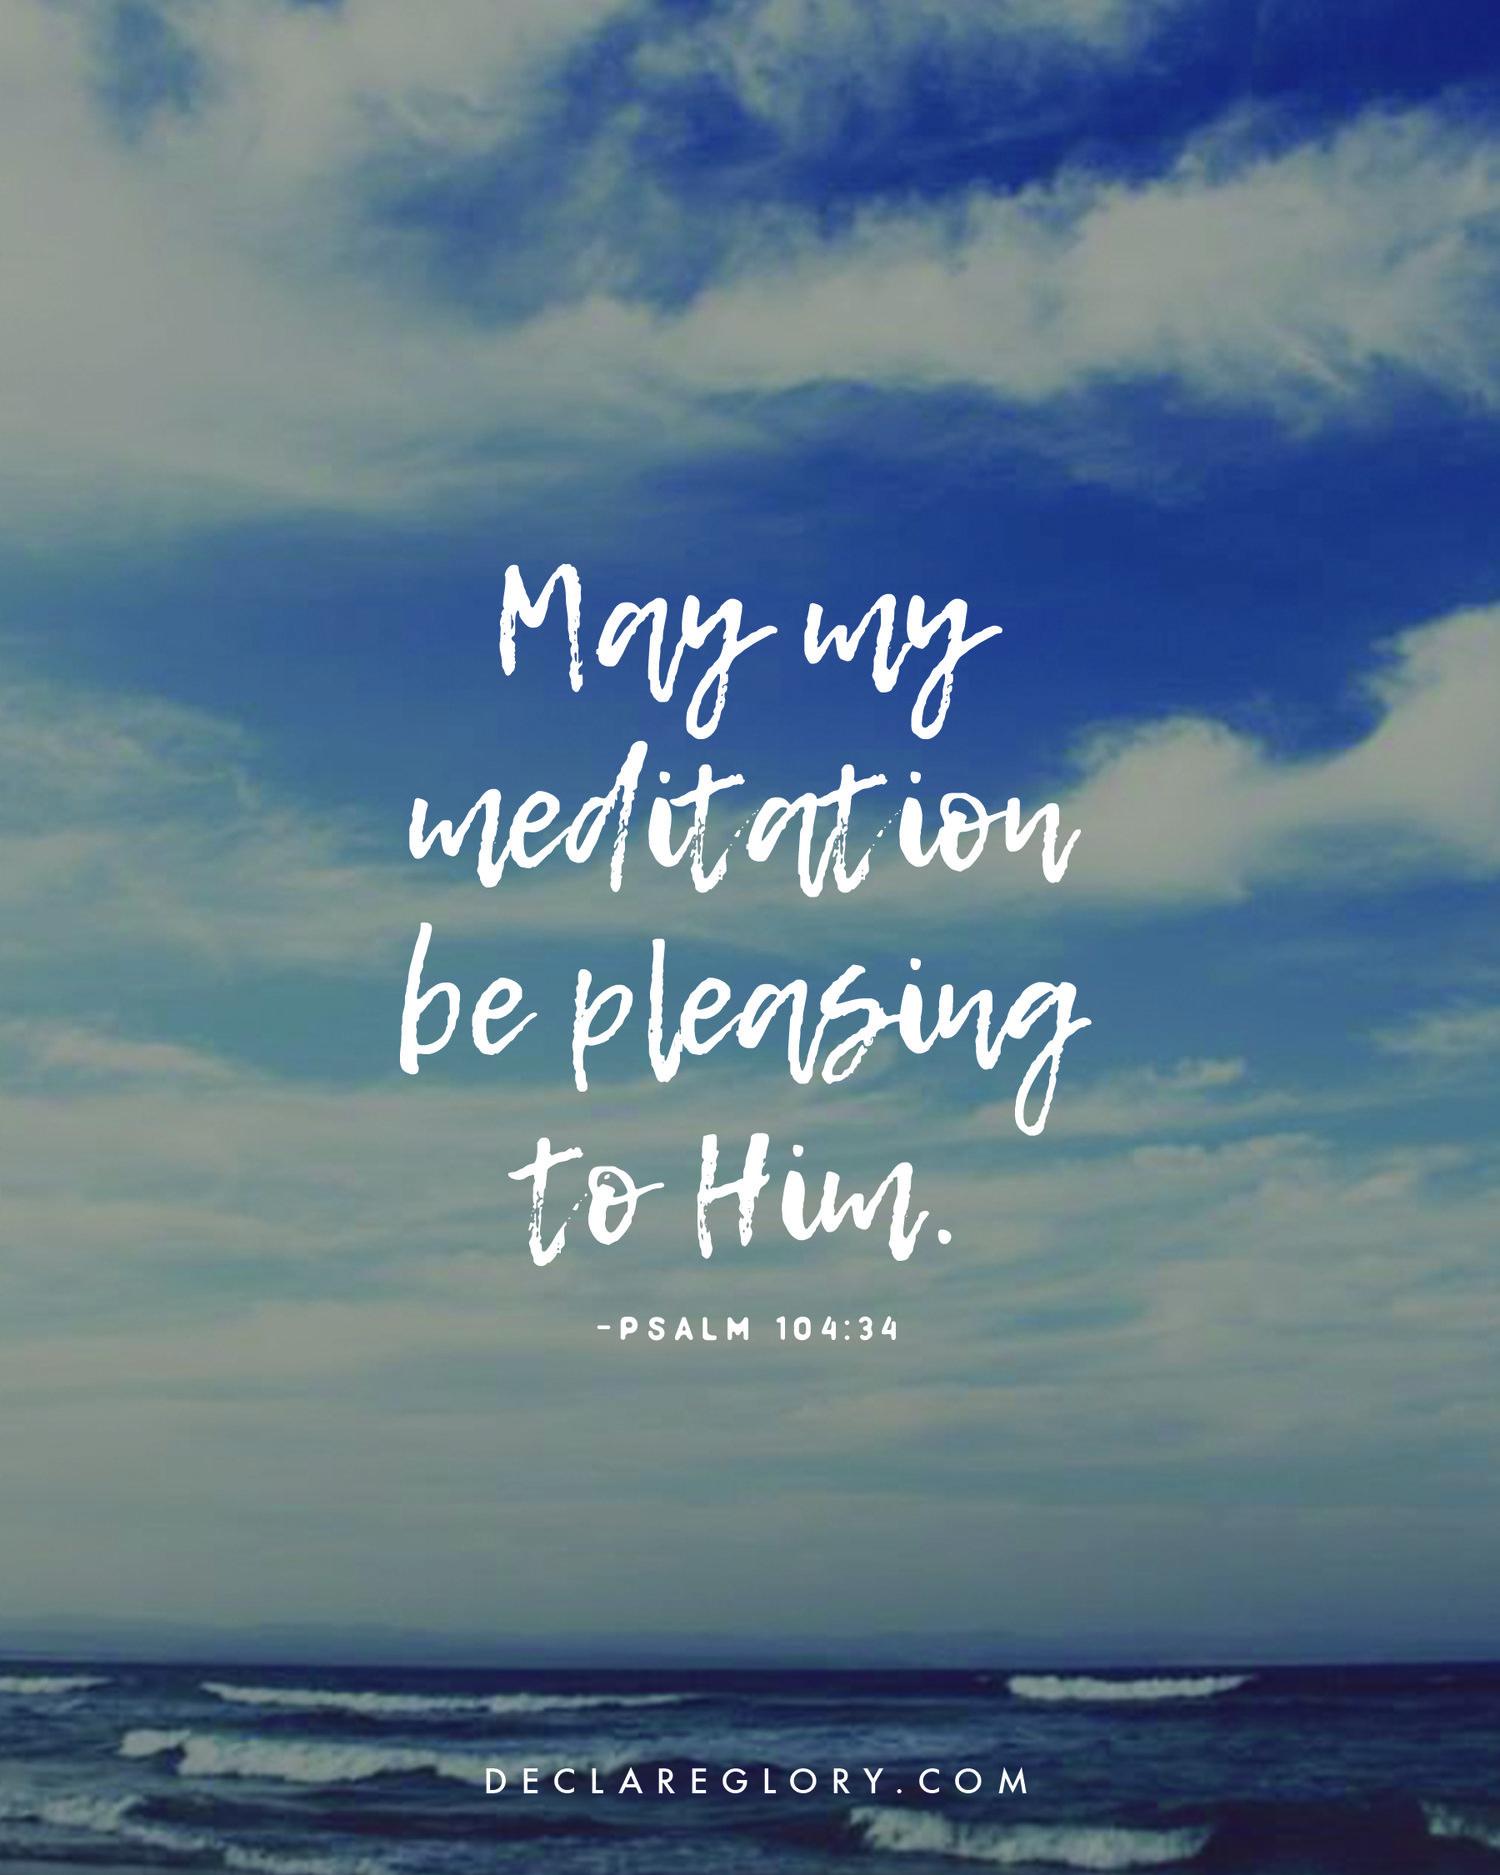 Day 39: Psalm 104:24-35 — Declare Glory